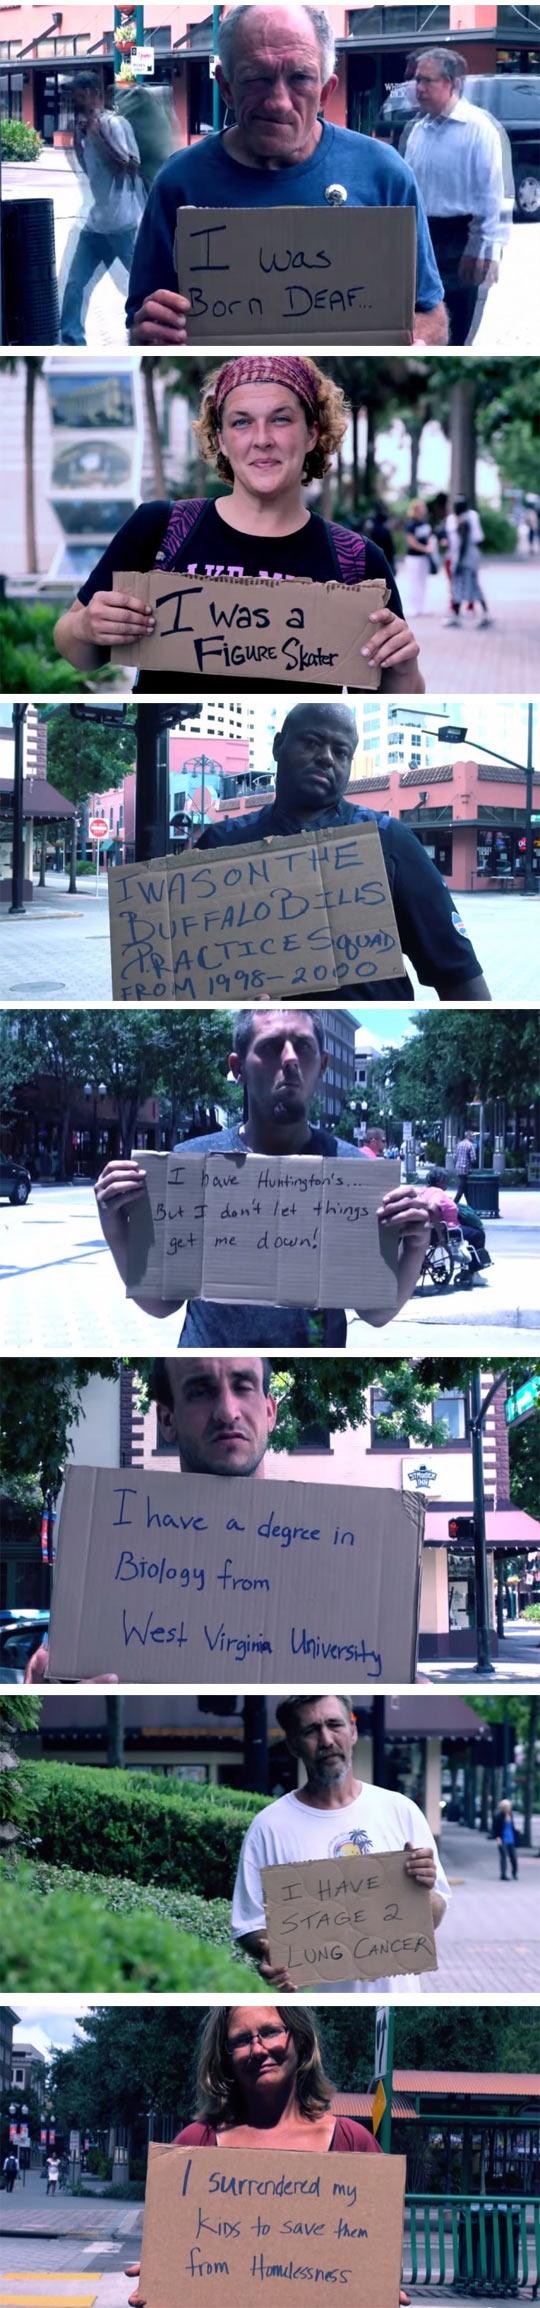 funny-homeless-cardboard-stories-street-university